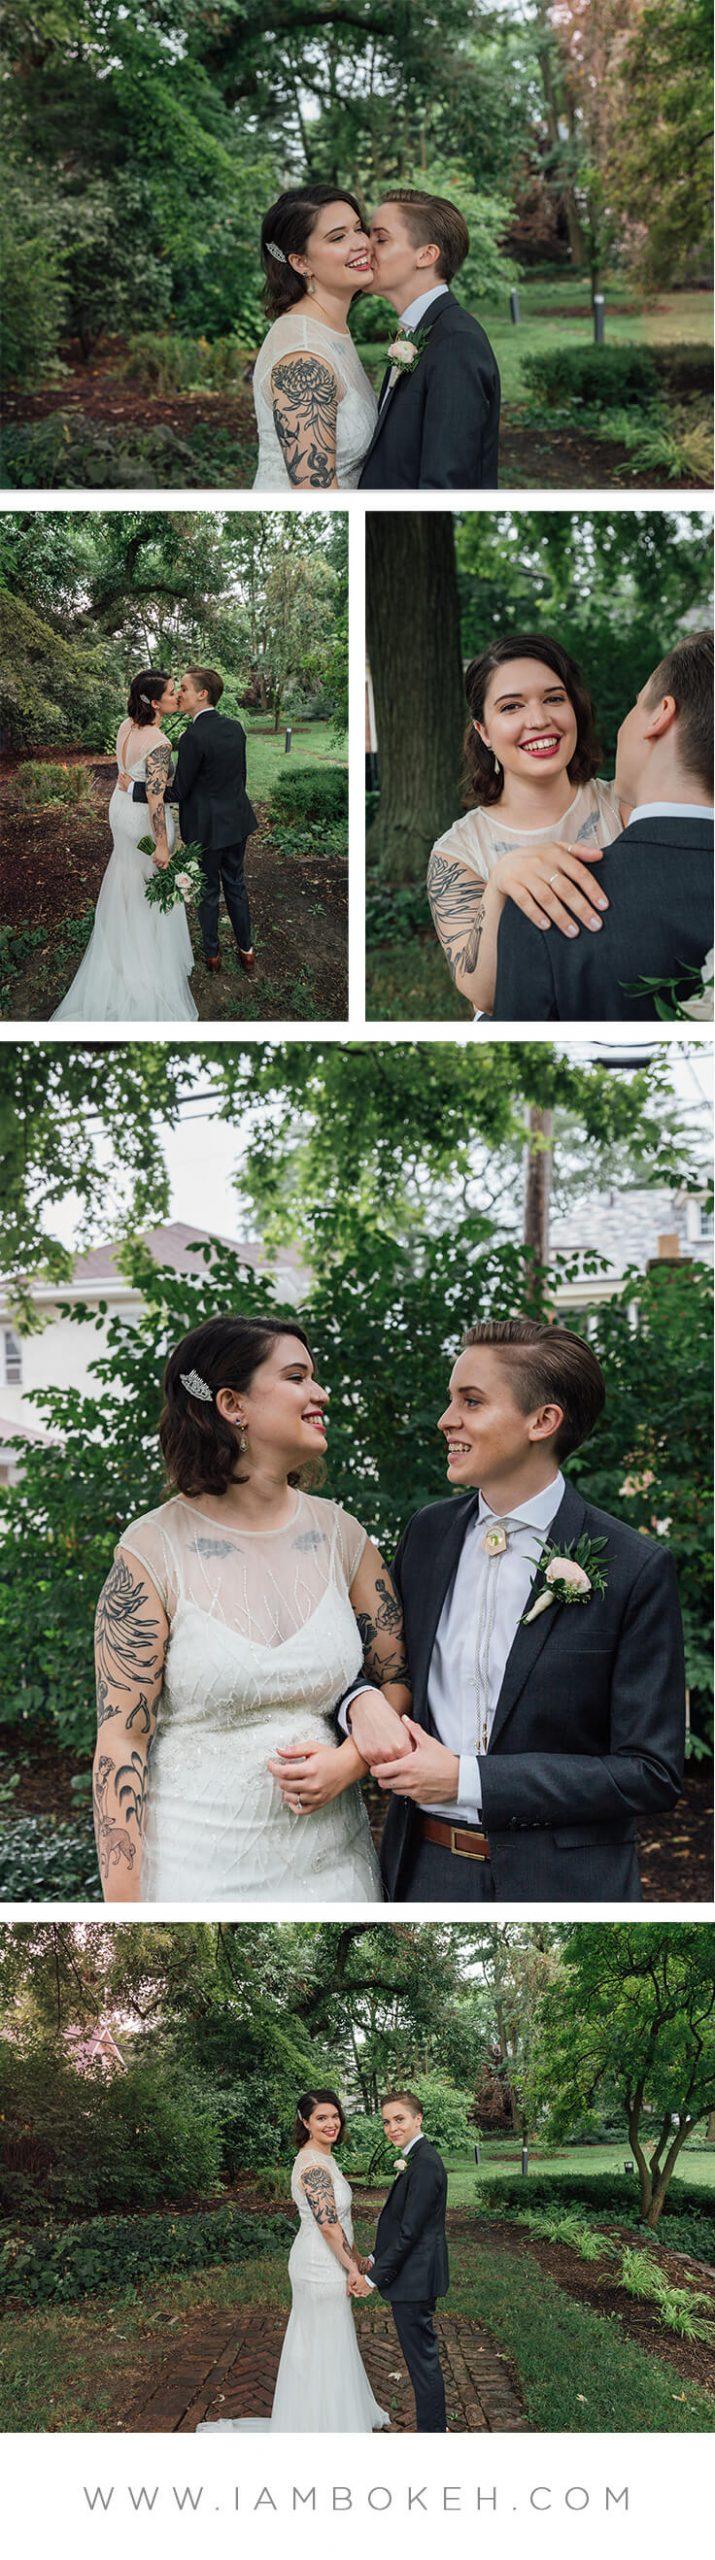 Bokéh Studios | Oak Park Wedding at Cheney Mansion: Elise & Suzannah